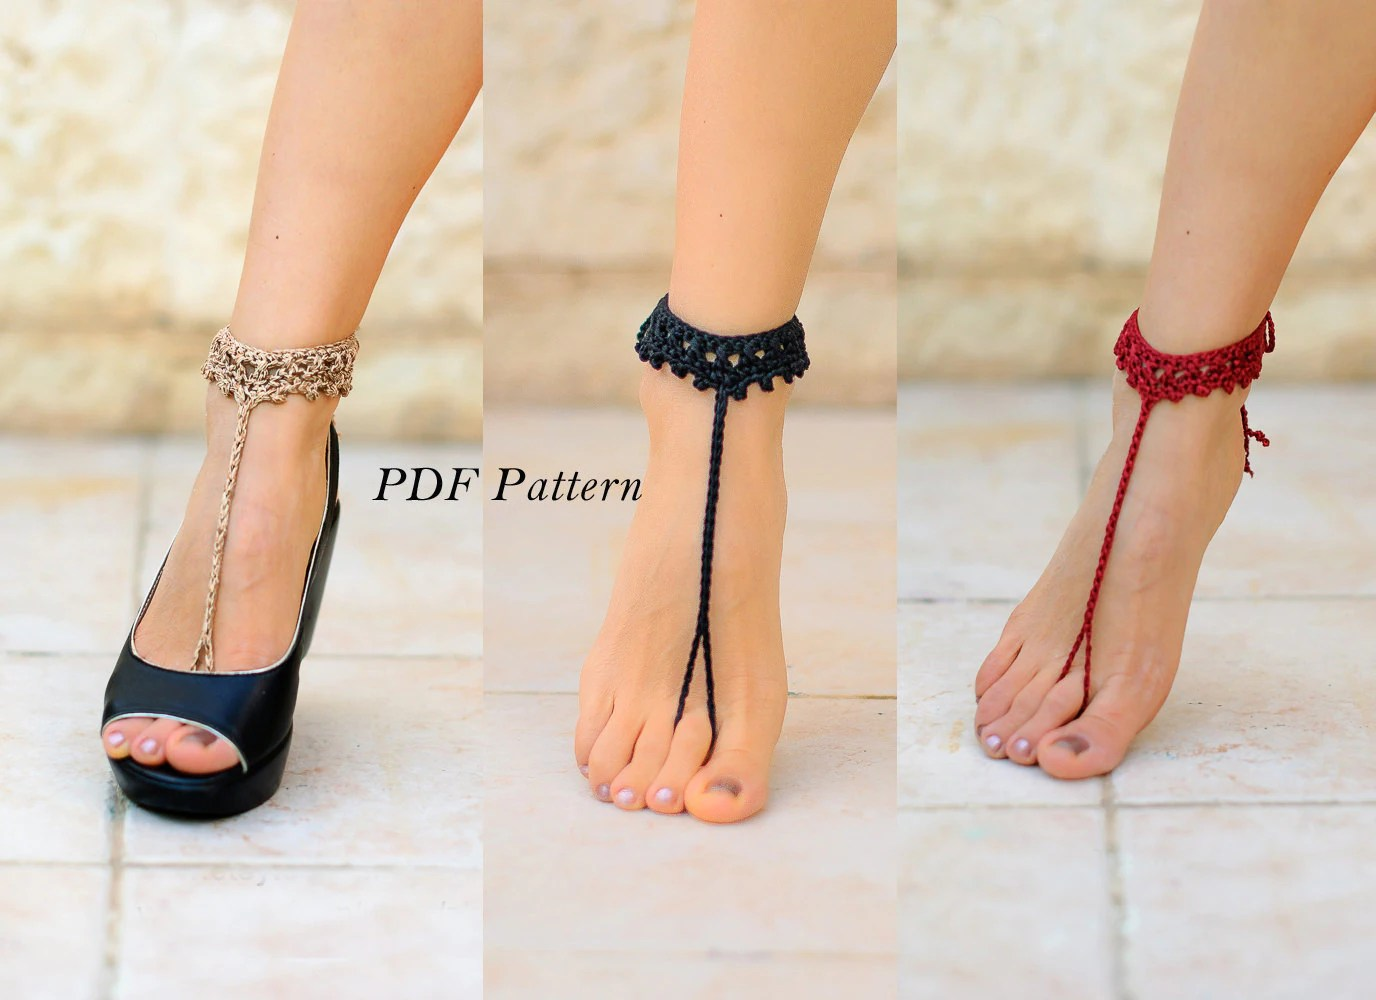 Pdf Crochet Pattern #4 Instant Barefoot Sandals